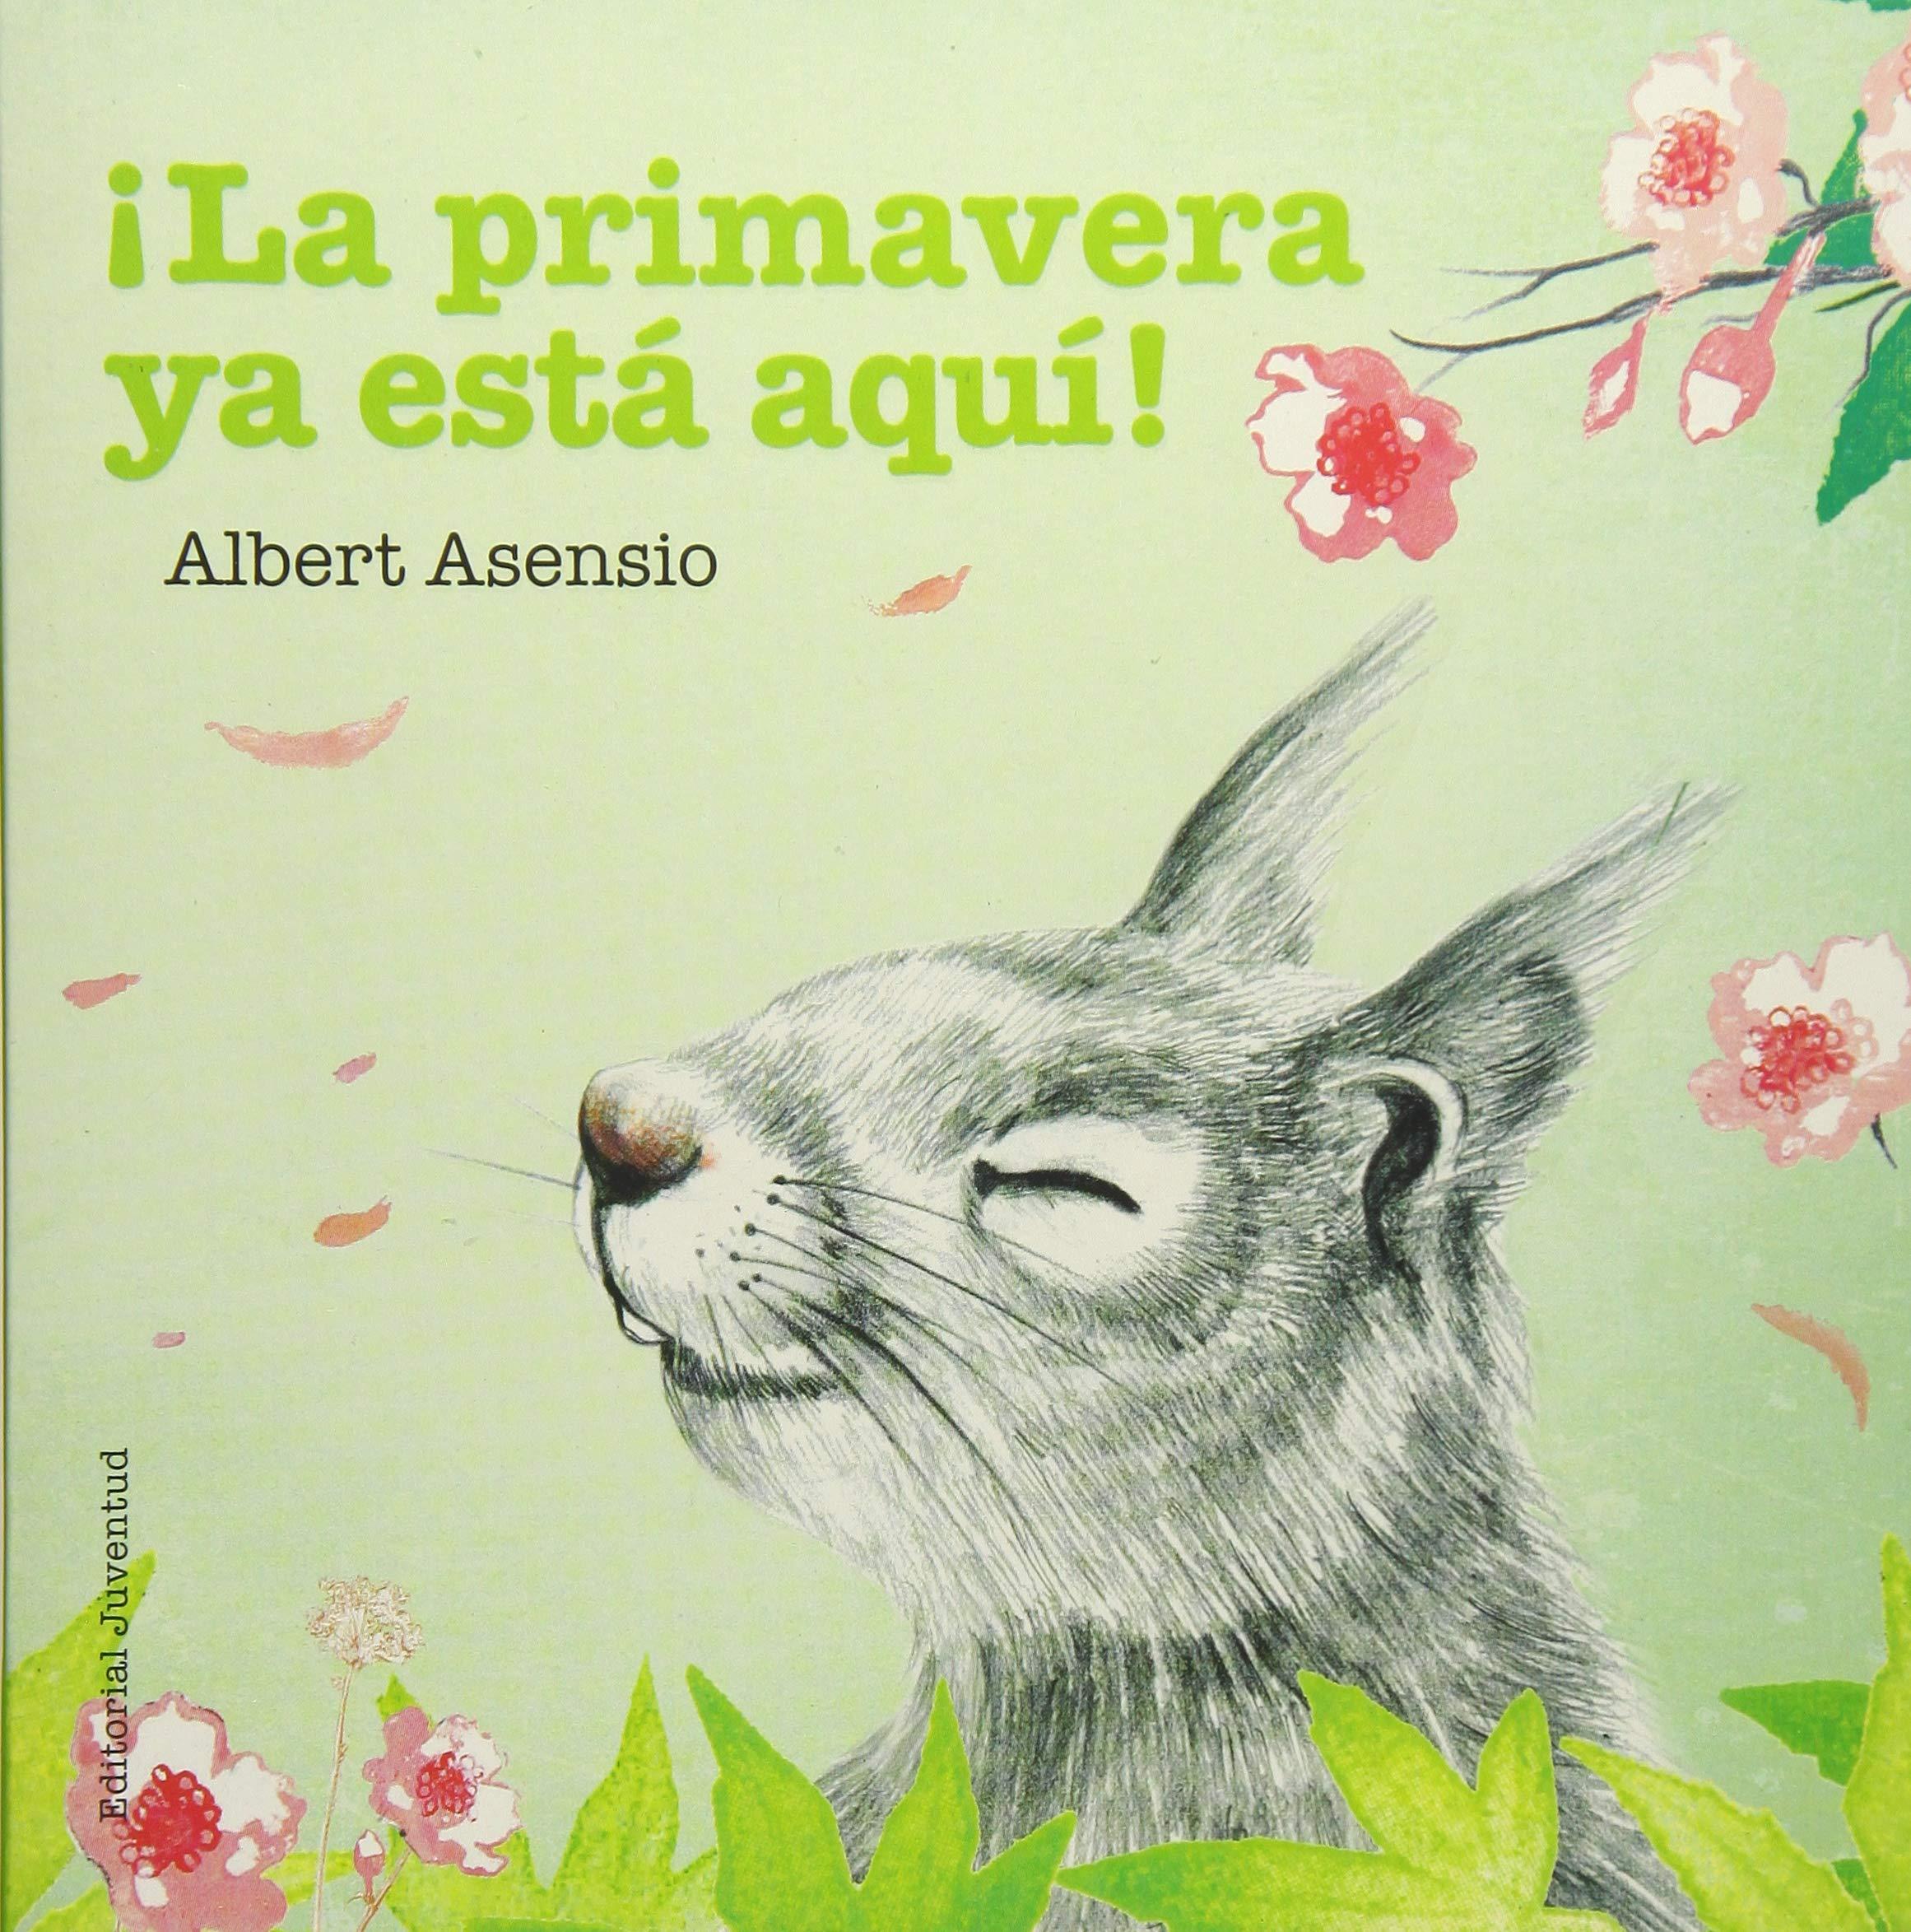 f0fb96bb4cc1 ¡La primavera ya está aquí! (Spanish Edition) (Spanish) Board book –  November 3